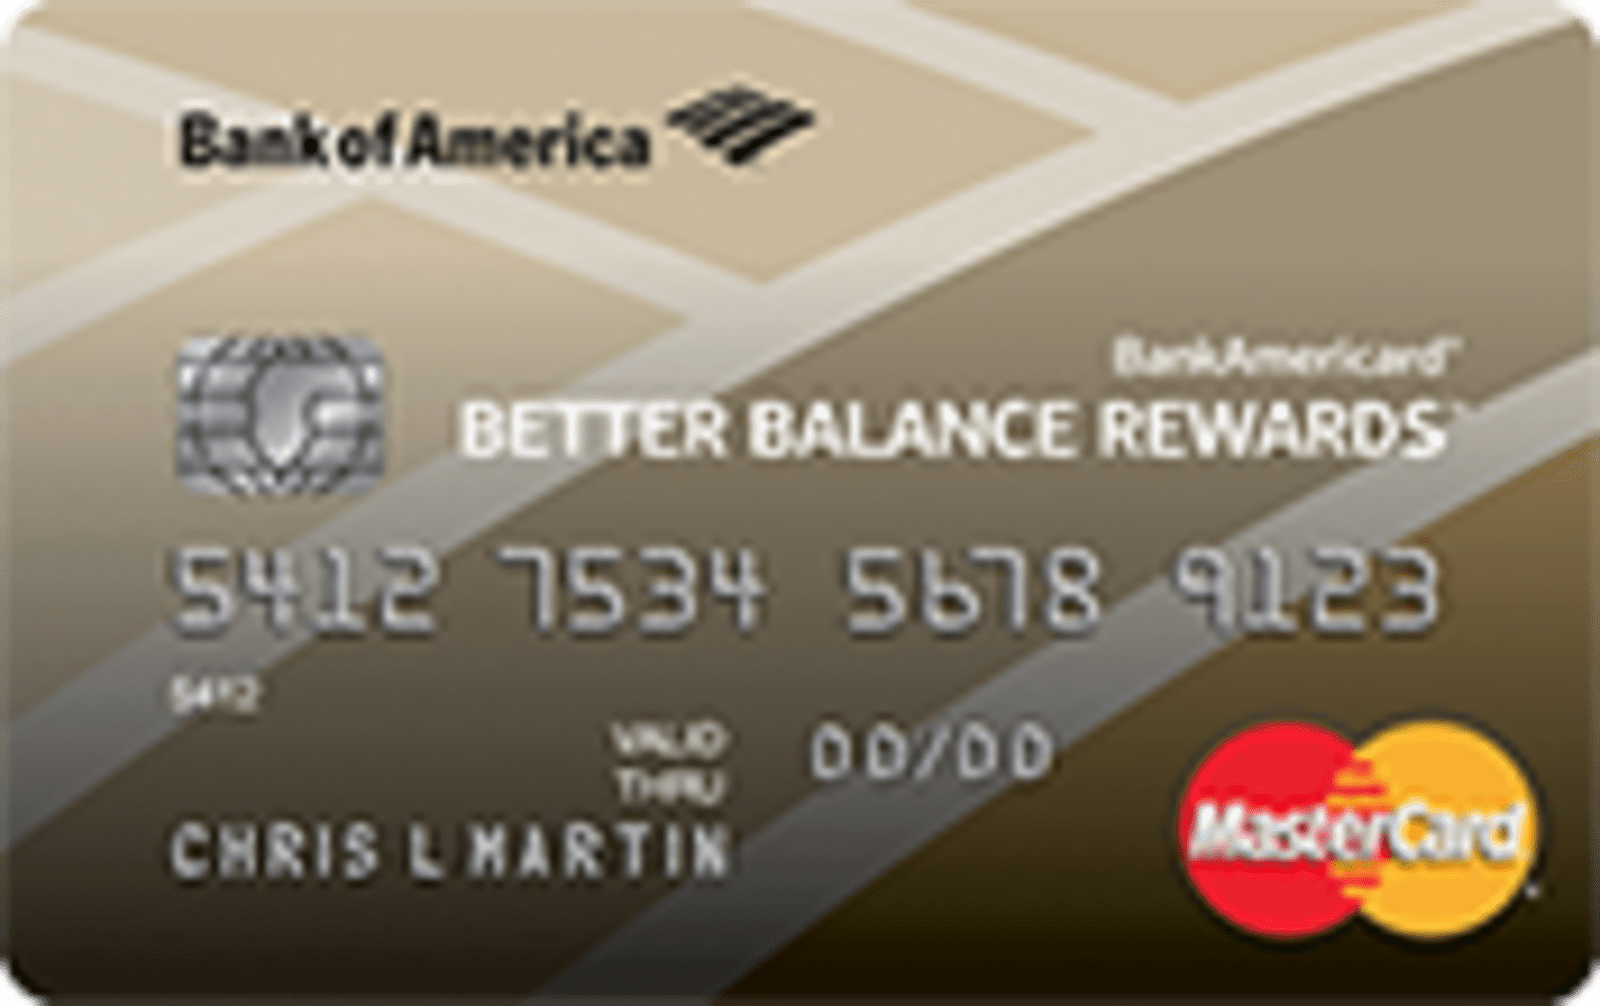 BankAmericard® Better Balance Rewards